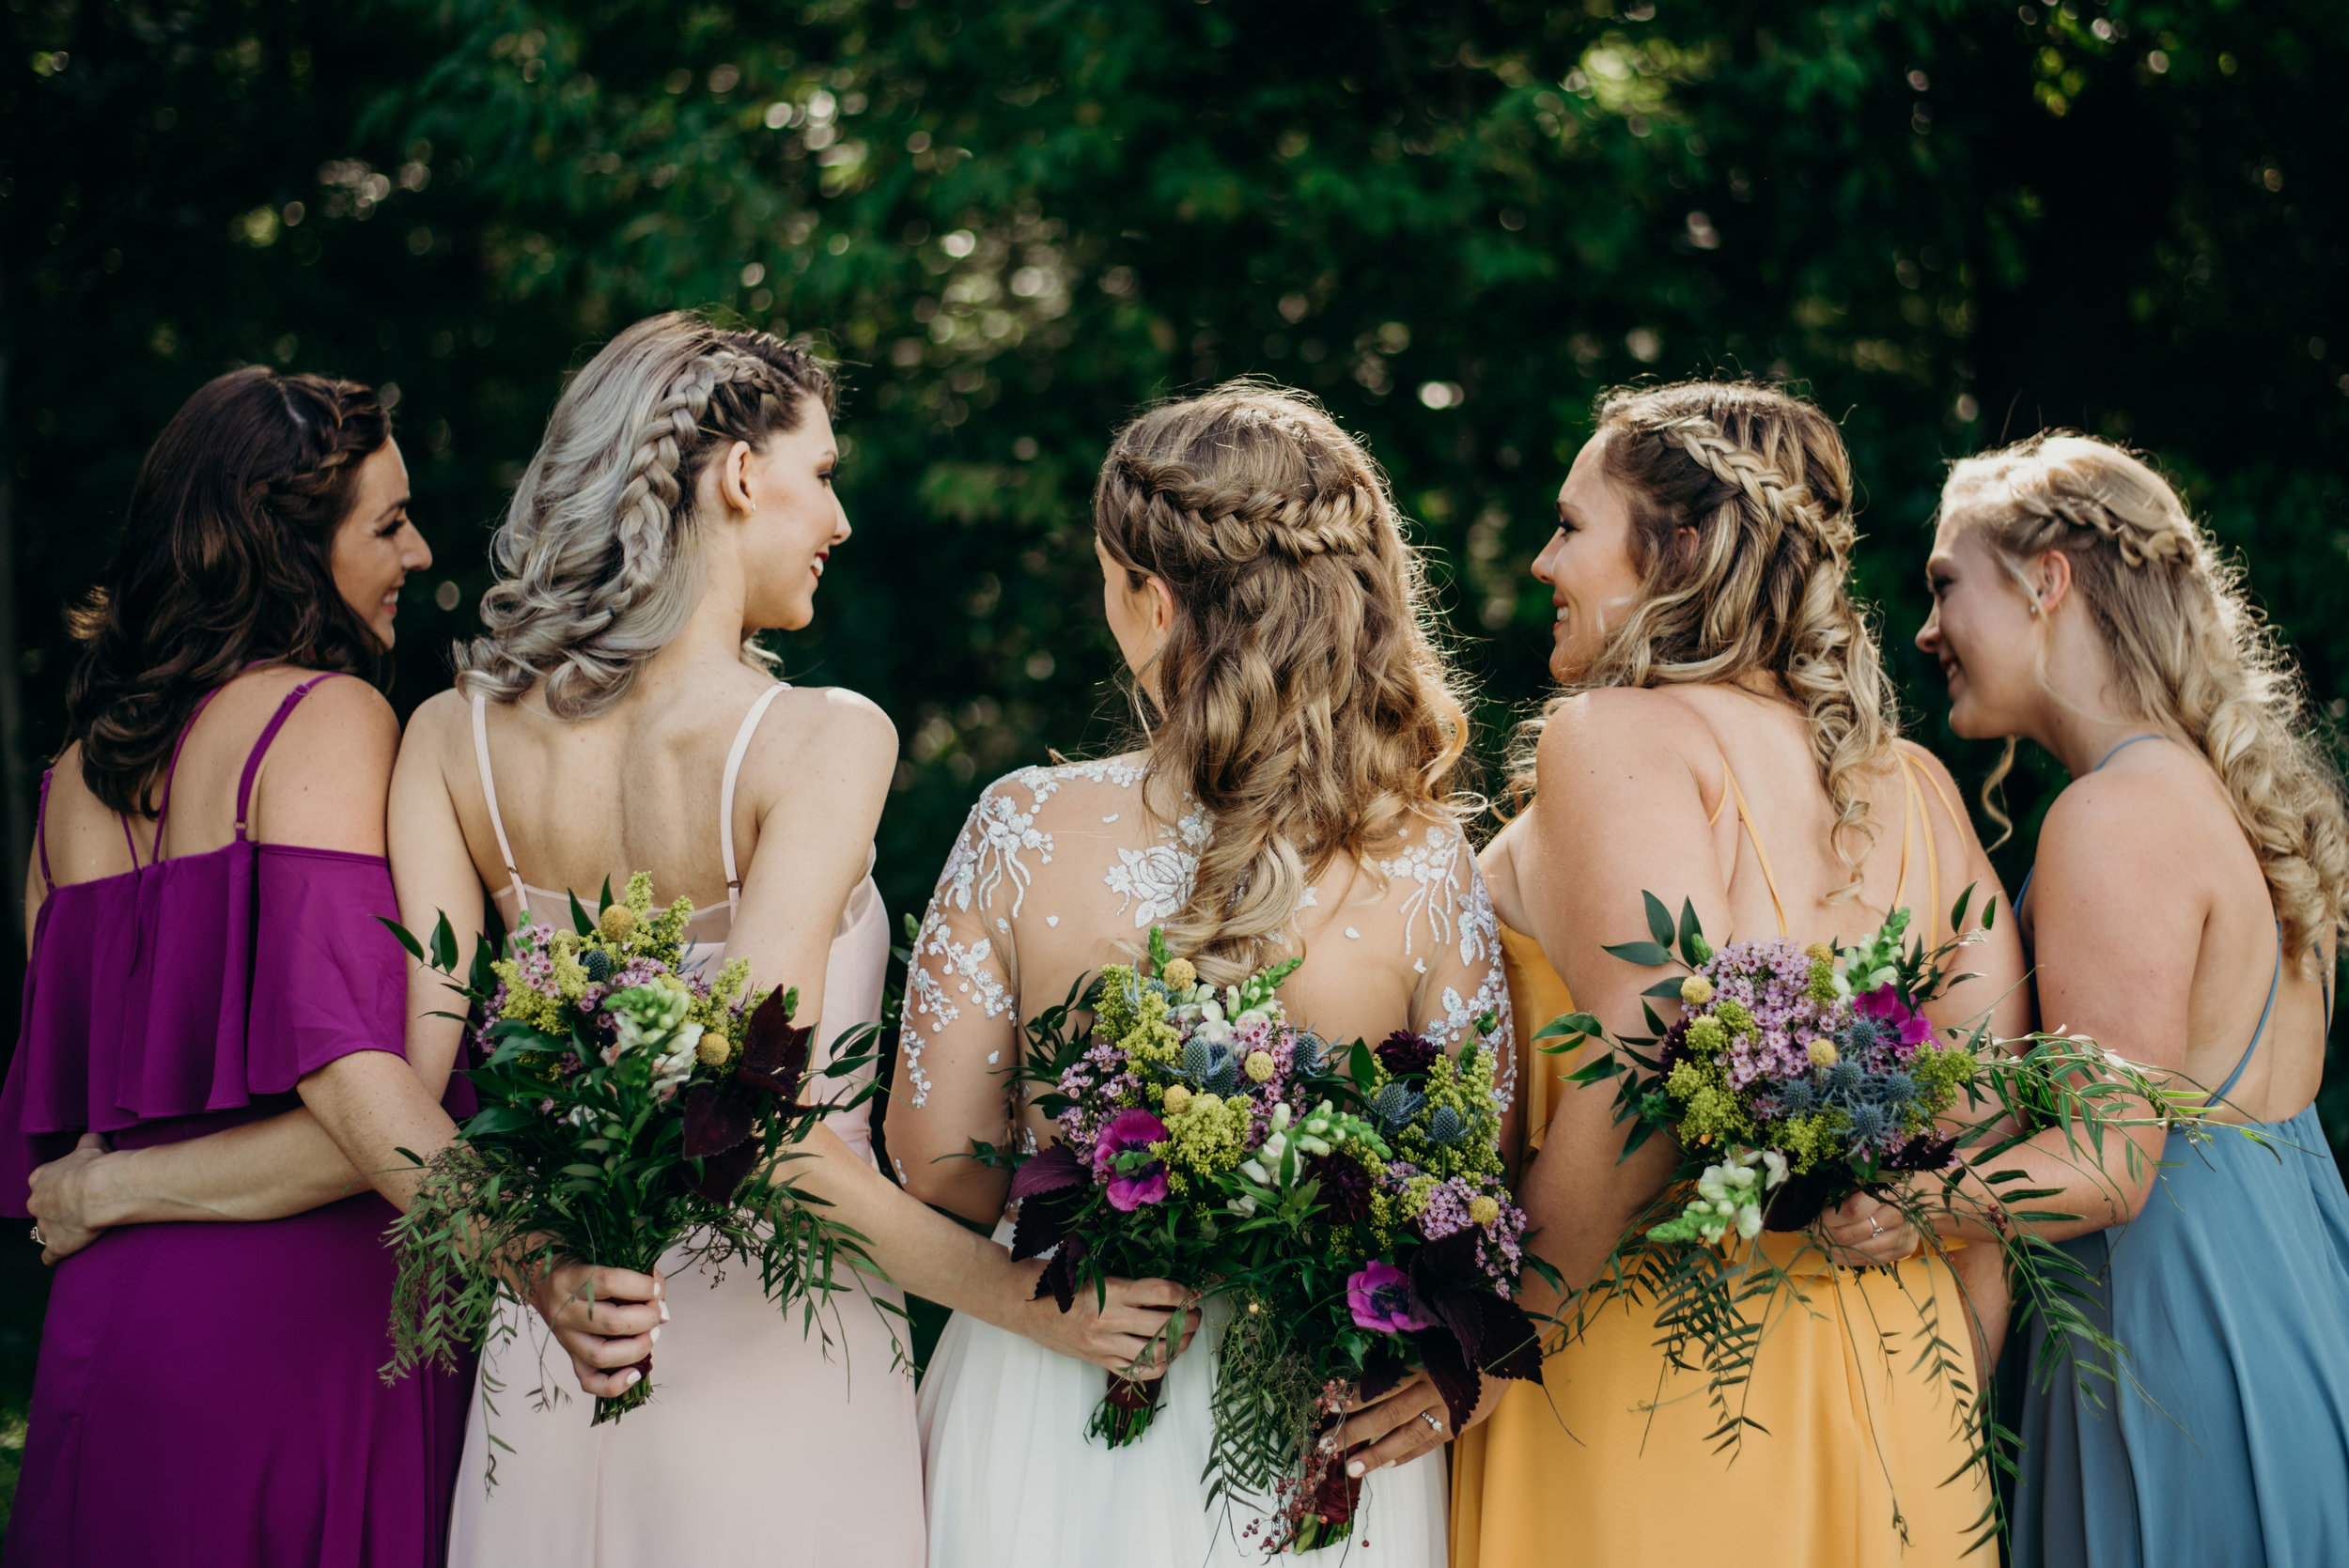 ryan-lauren-wedding-at-montfair-resort-farm-lindsey-paradiso-photography-1464.jpg